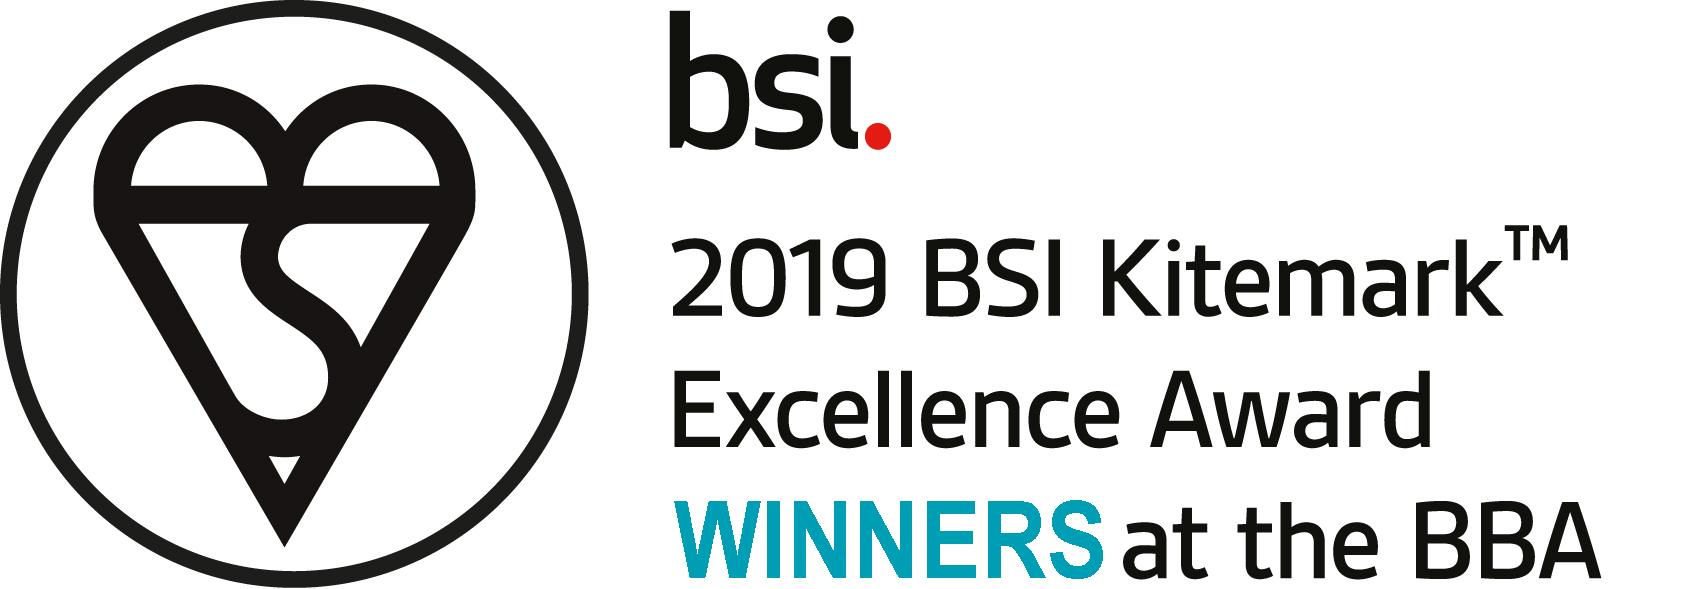 the bsi excellence award winner image